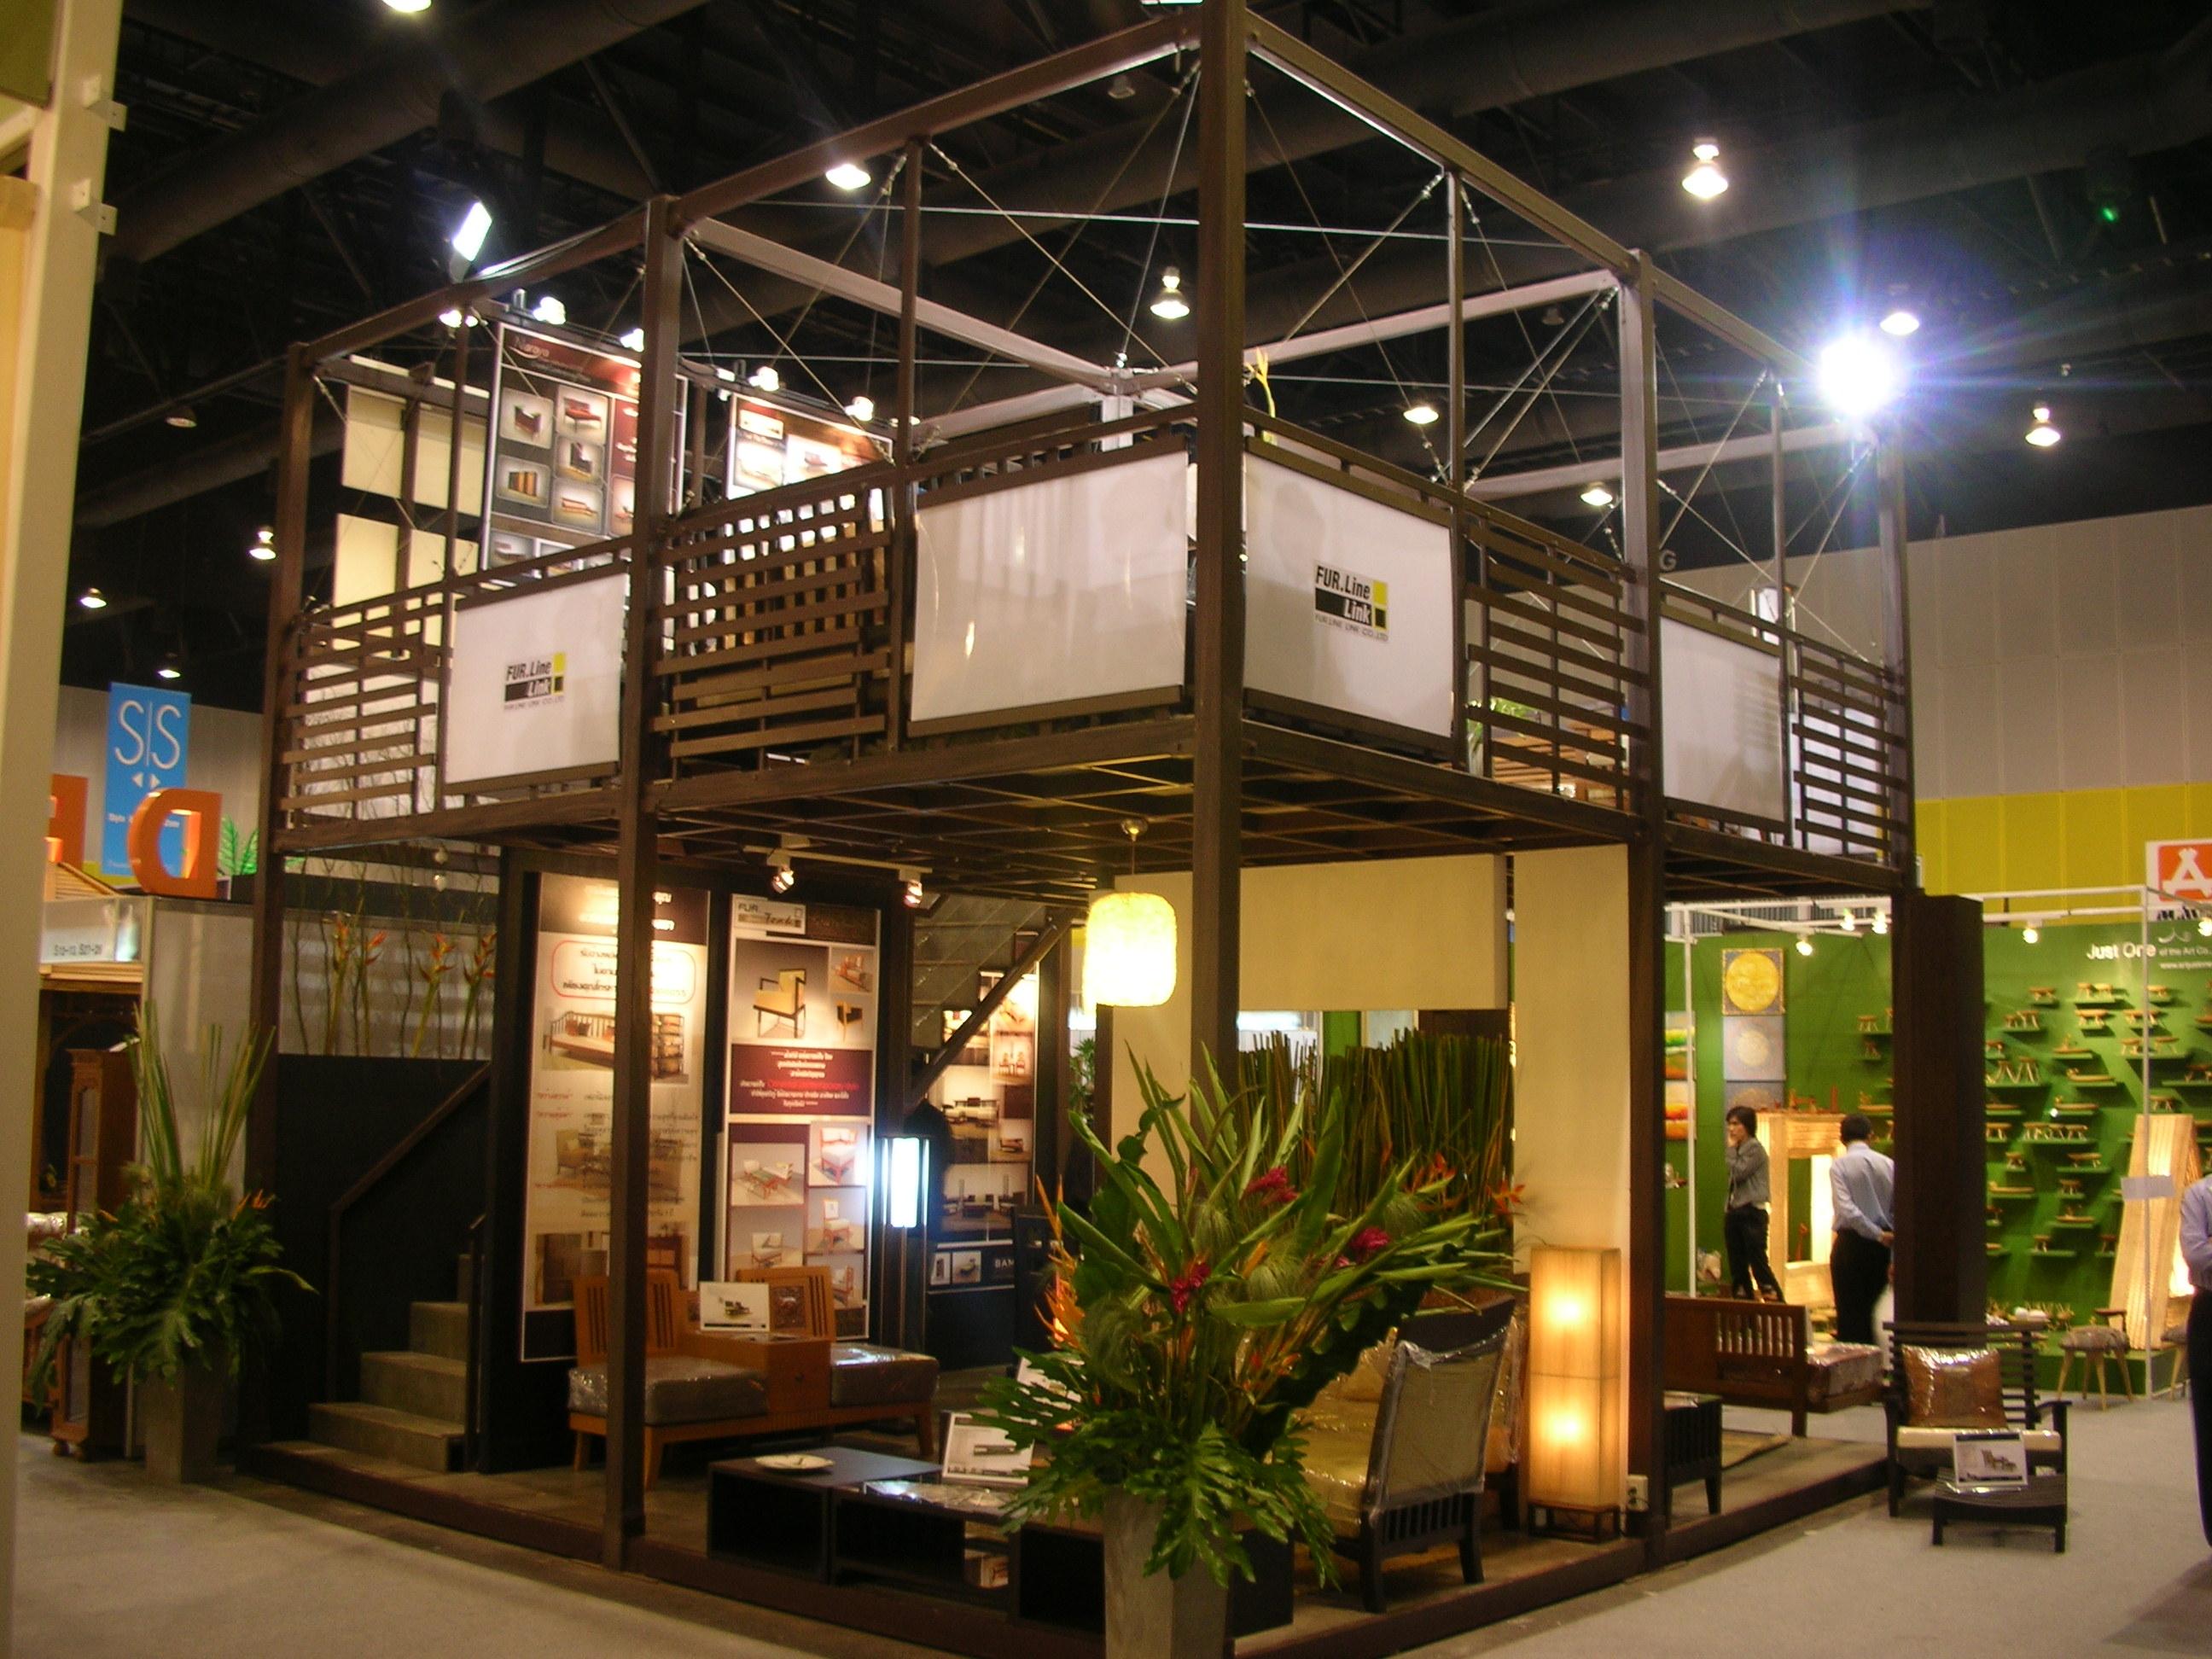 Exhibition Booth Decoration : Exhibition booth decoration design premium serve pir duct for